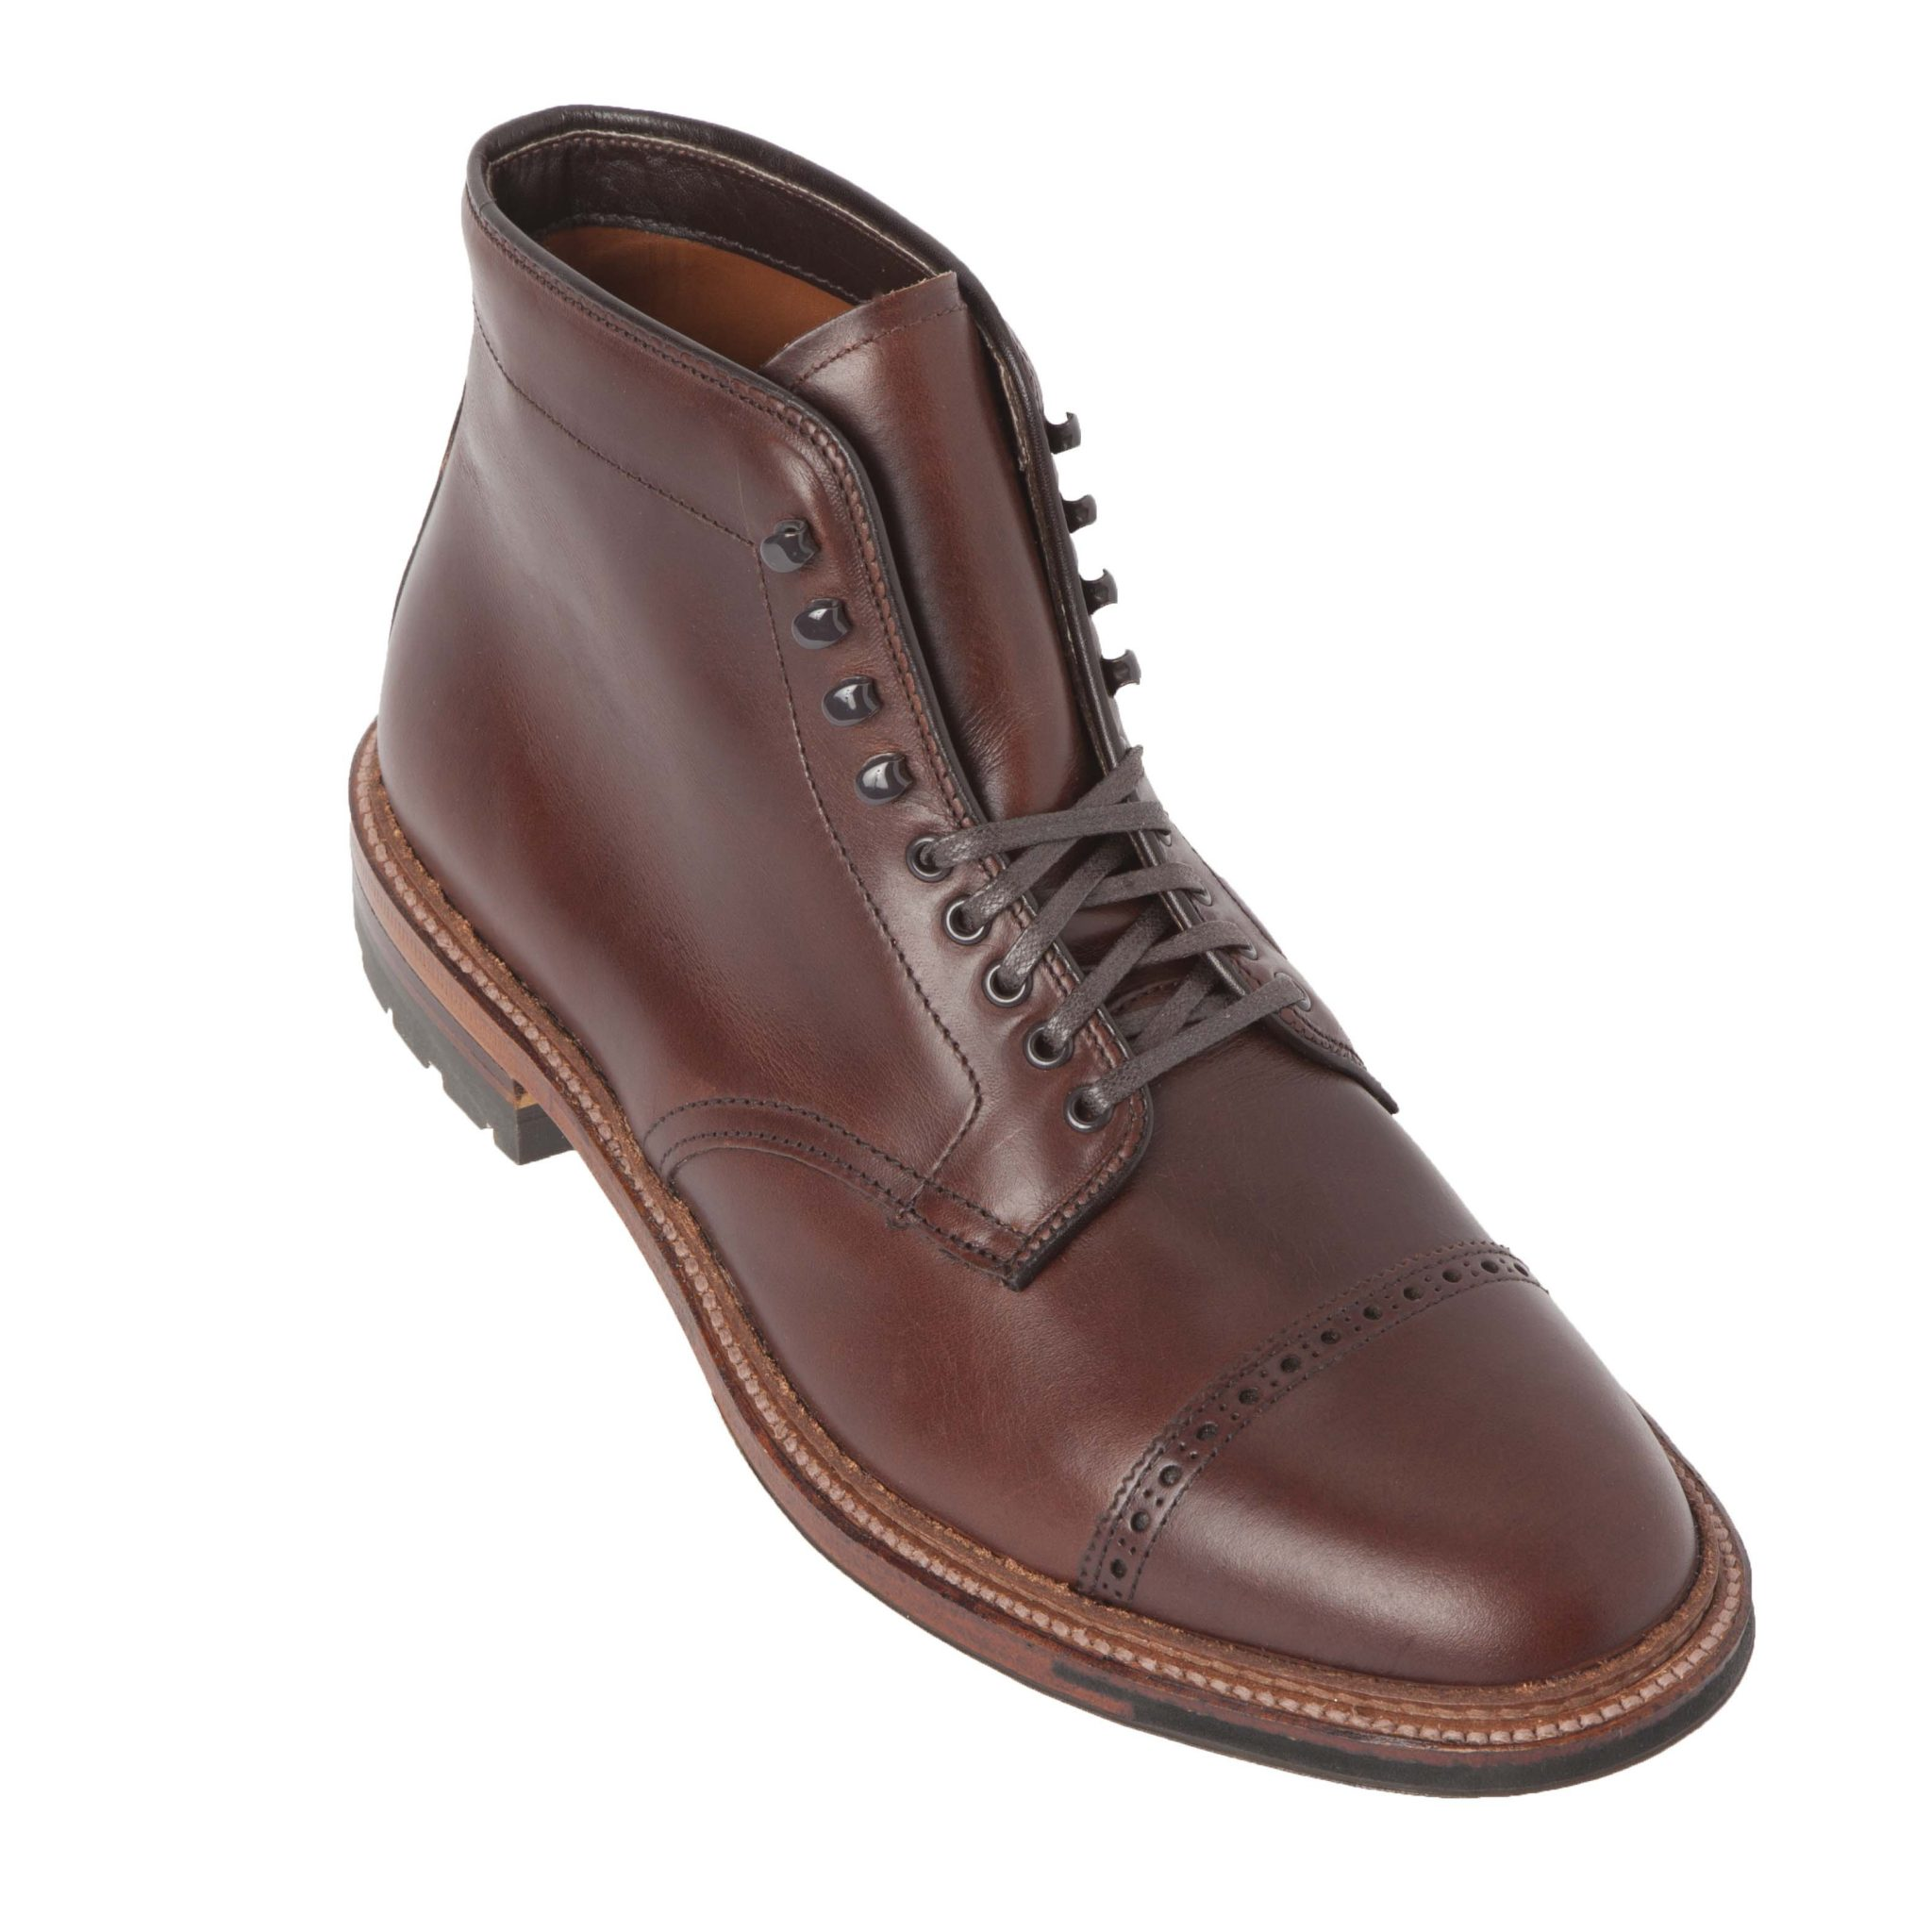 jumper boot brown chromexcel